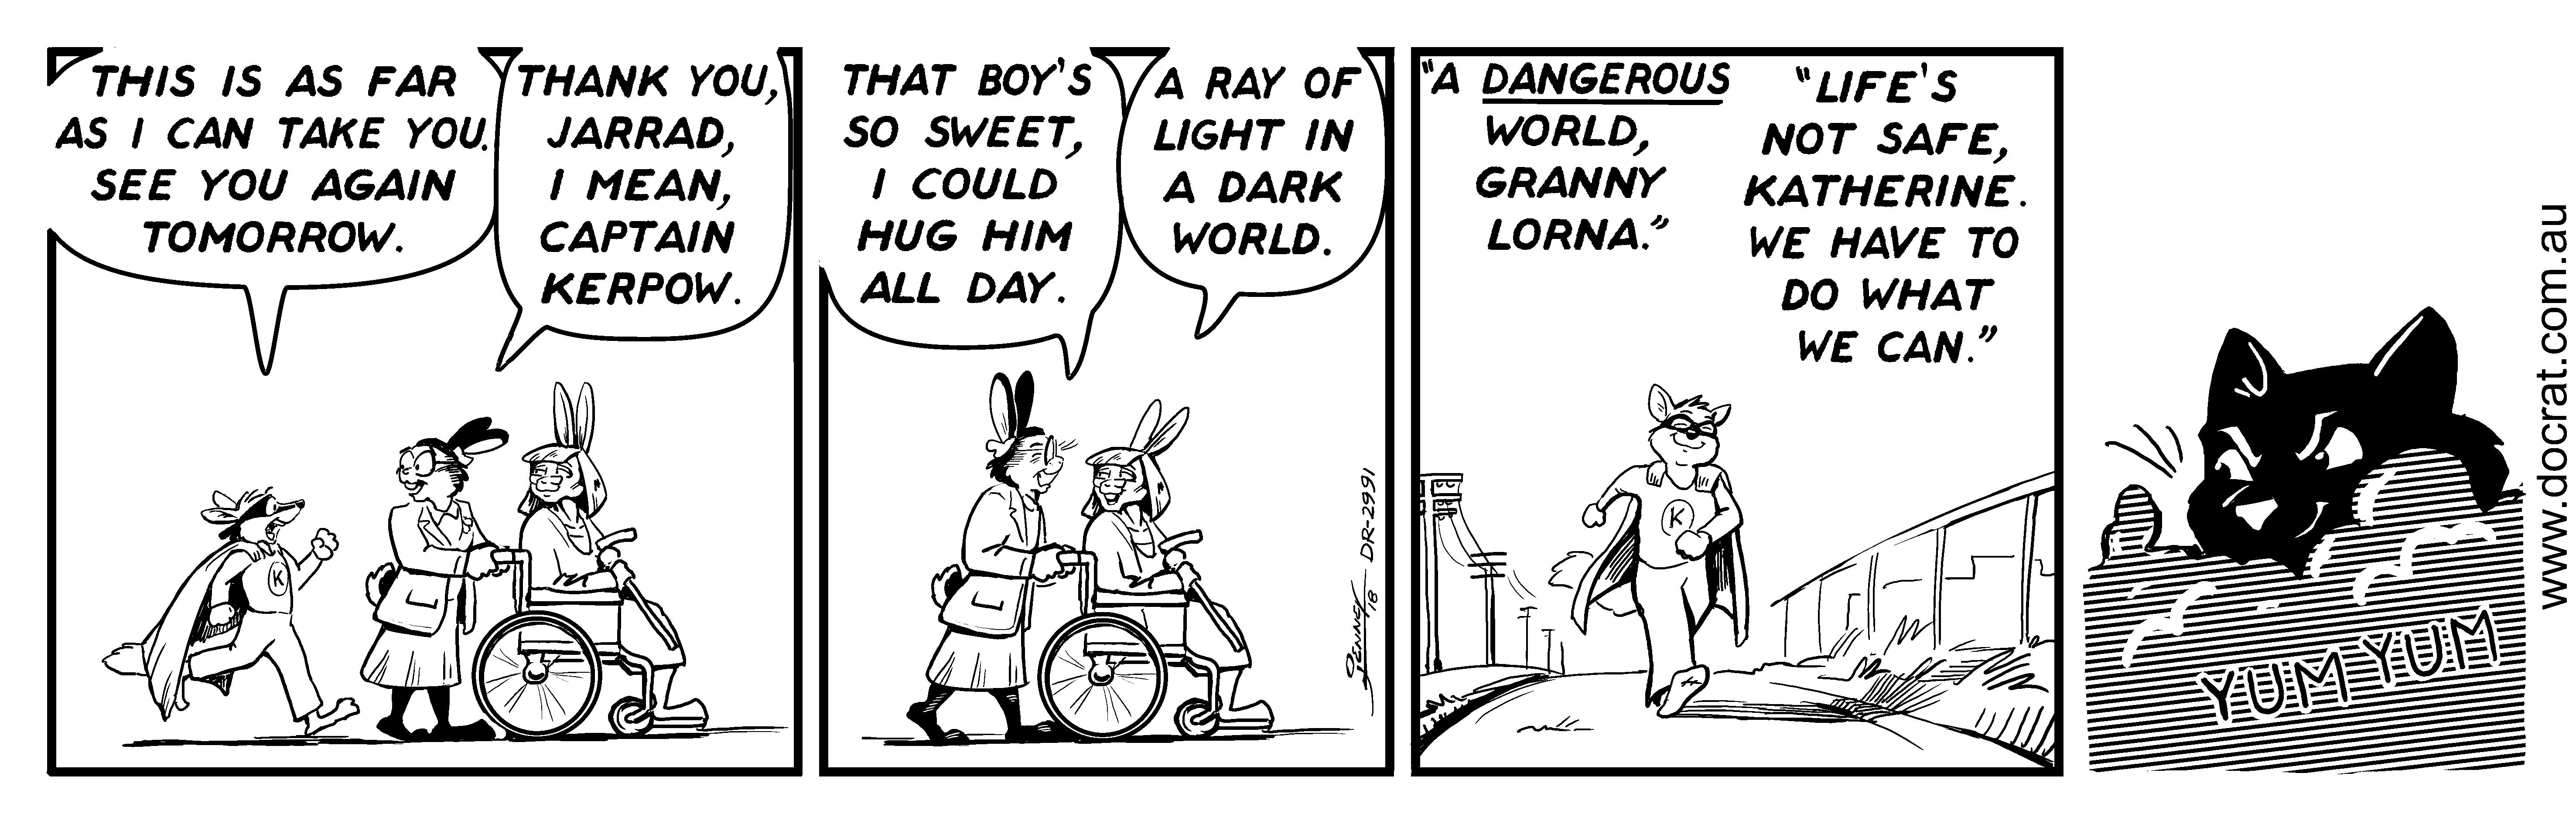 20180402